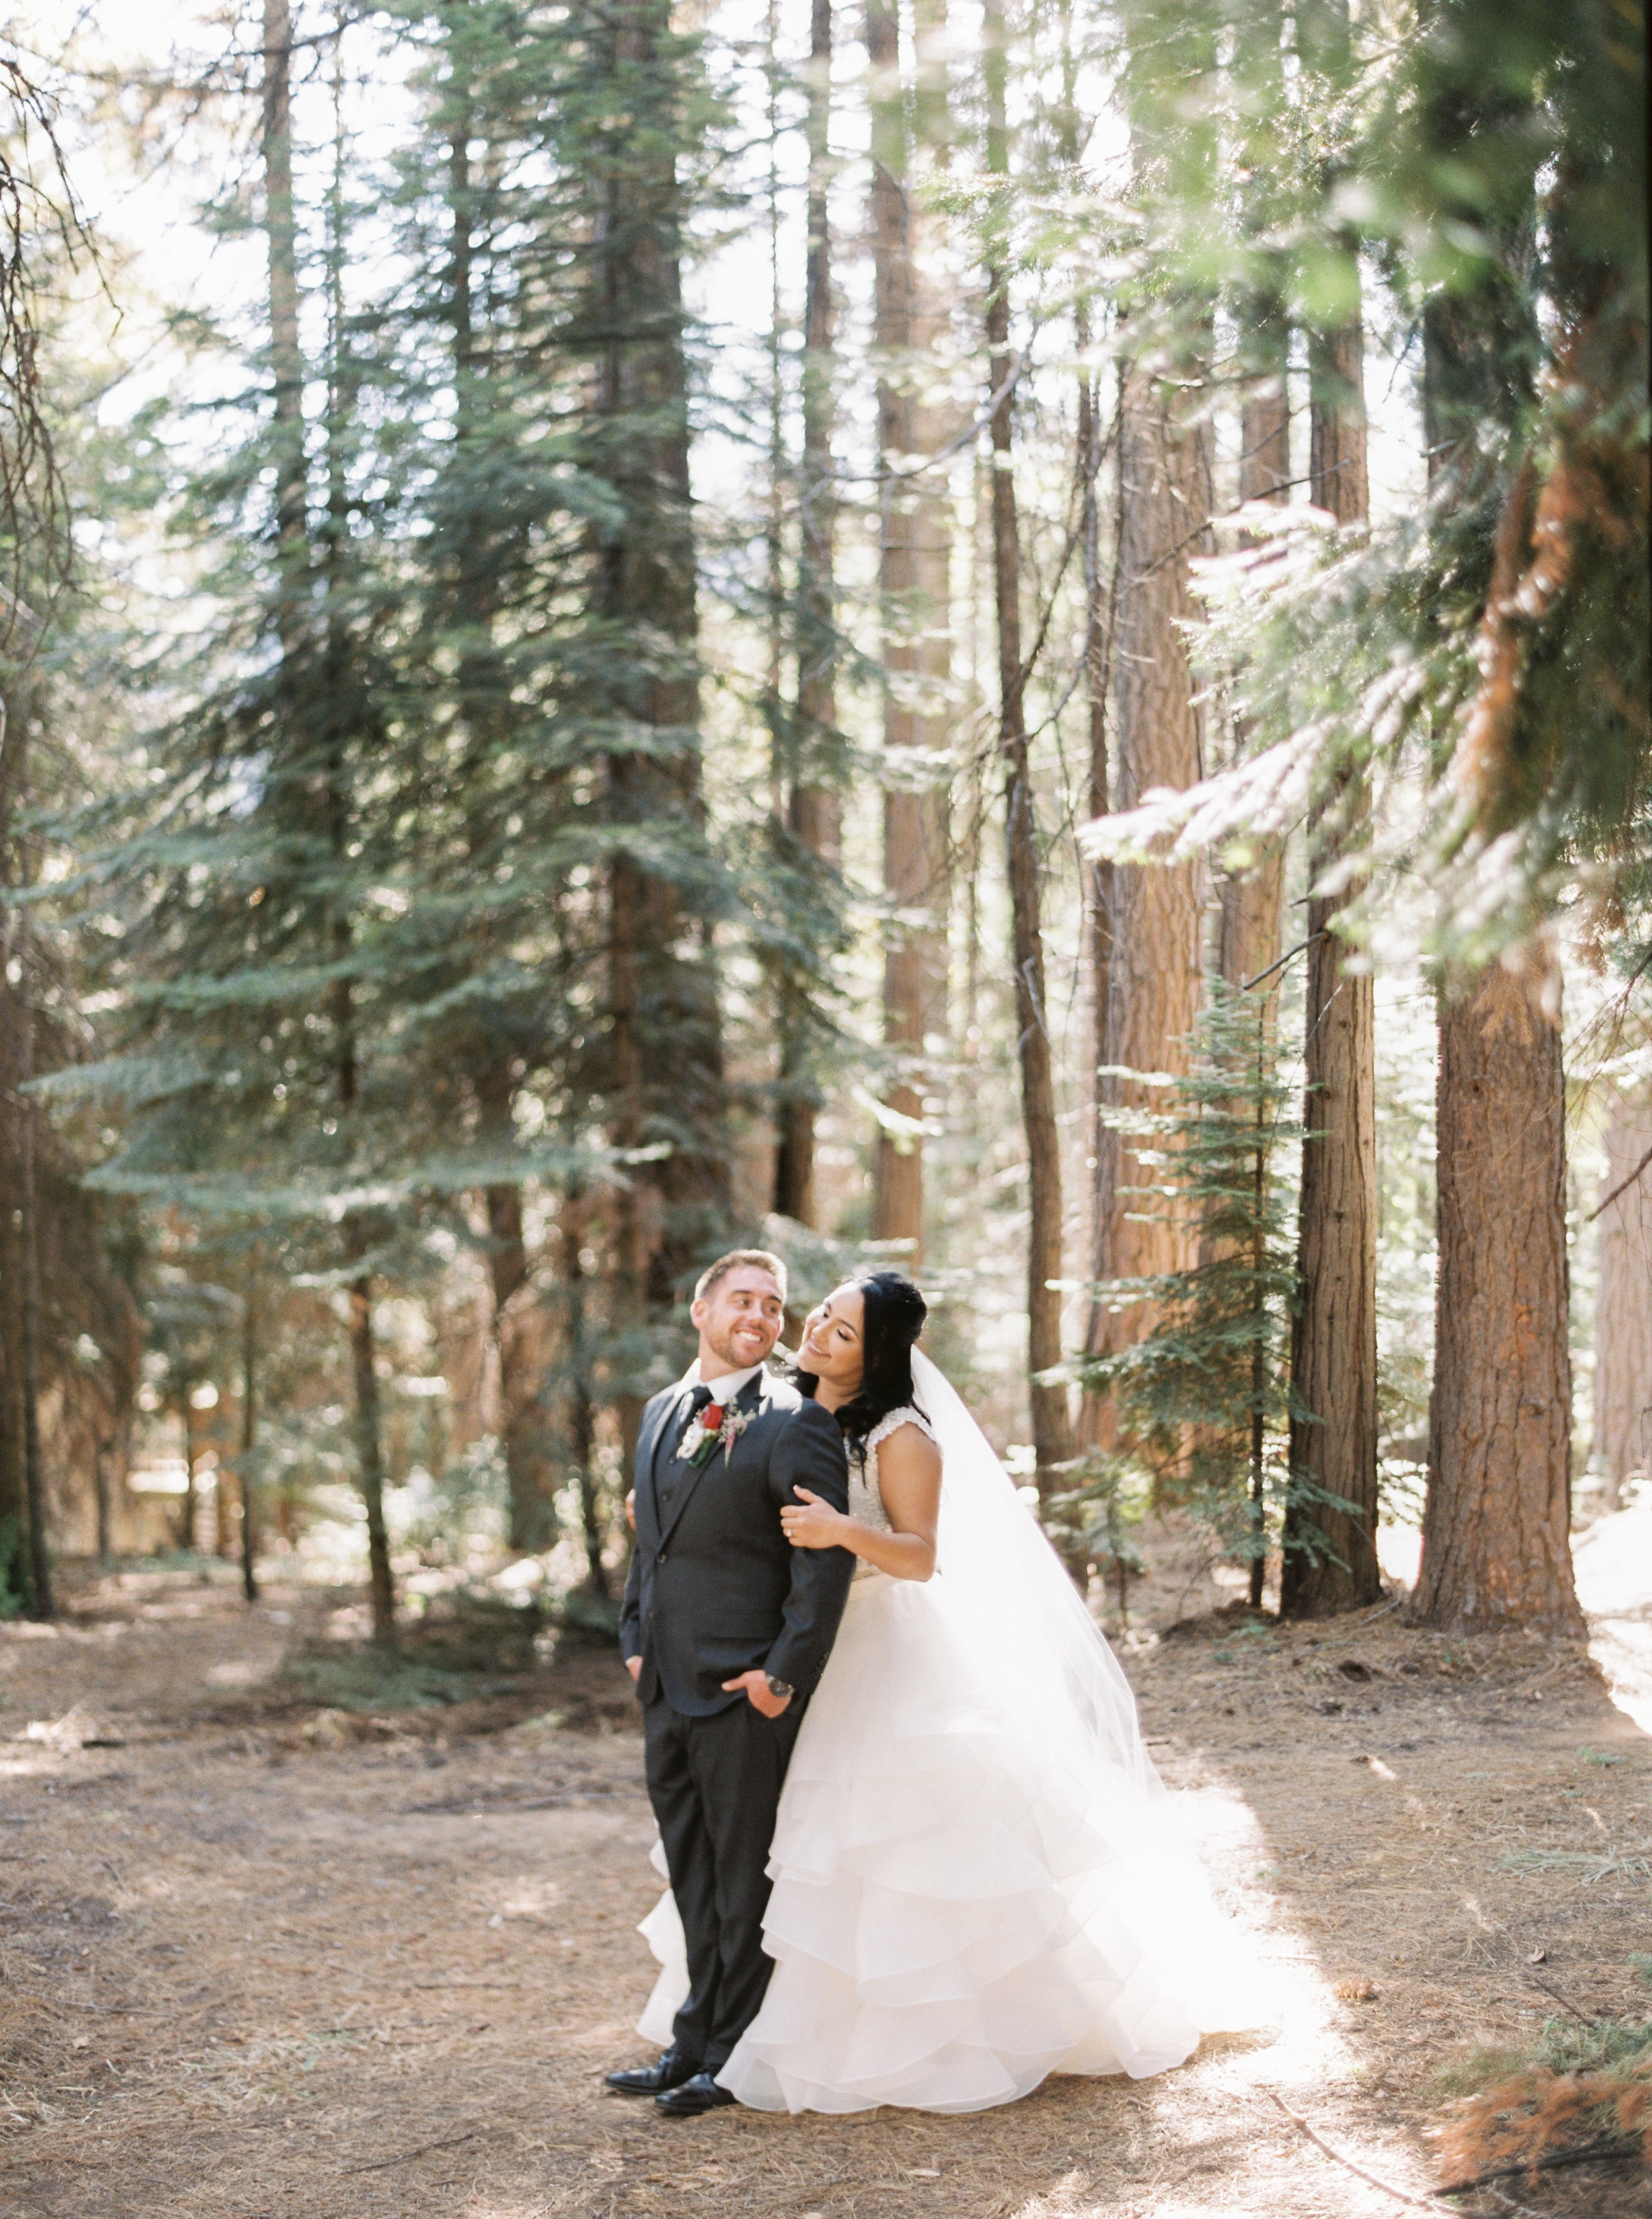 Tenaya-lodge-wedding-at-yosemite-national-park-california-39.jpg